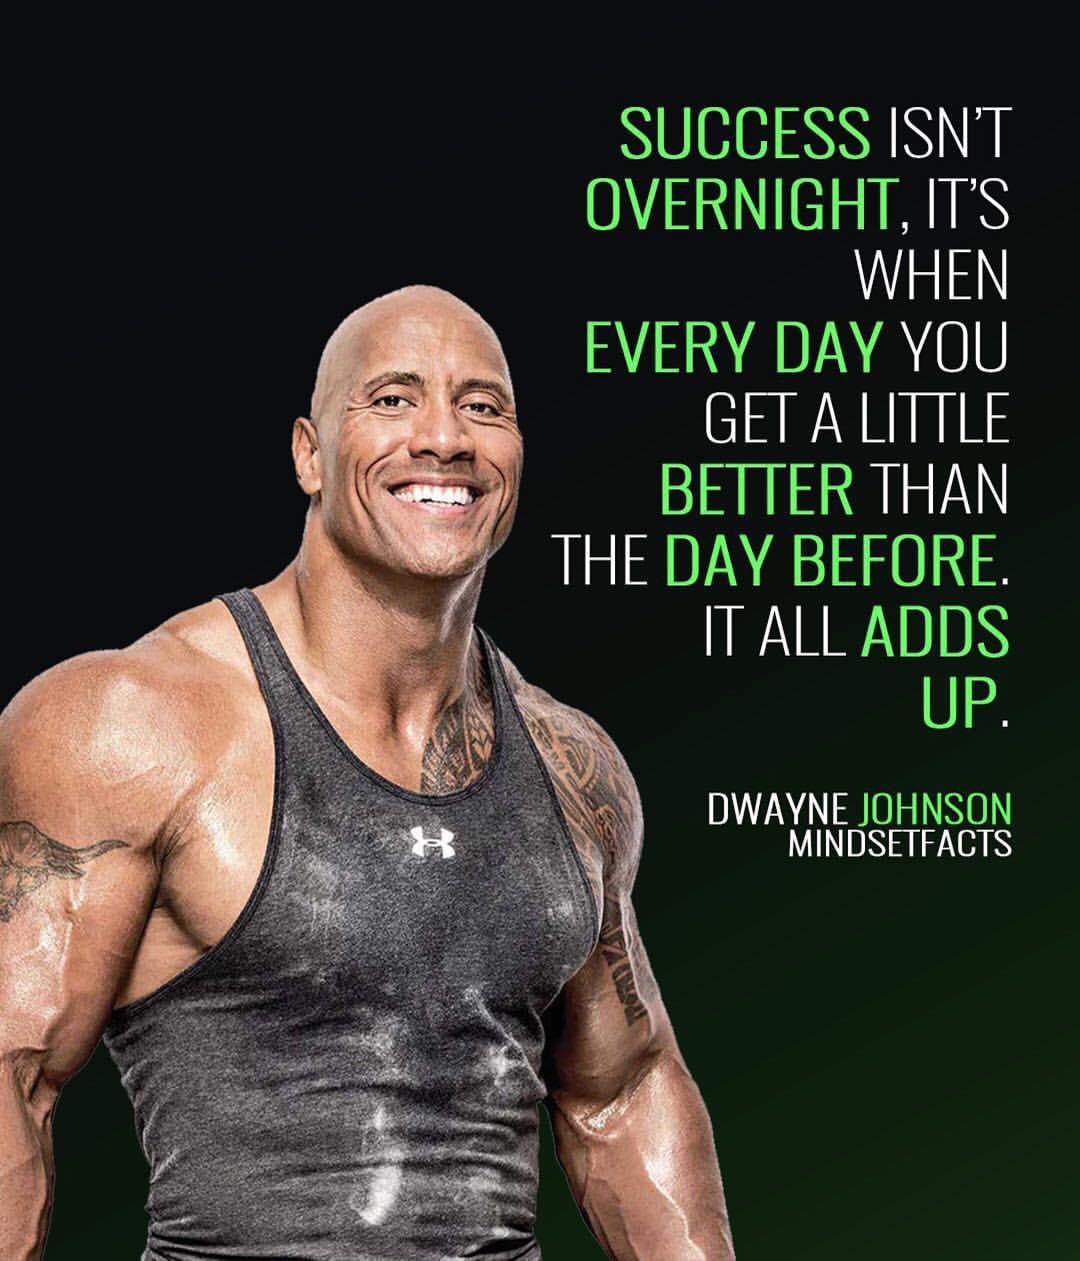 Dwayne Johnson Mindset Facts